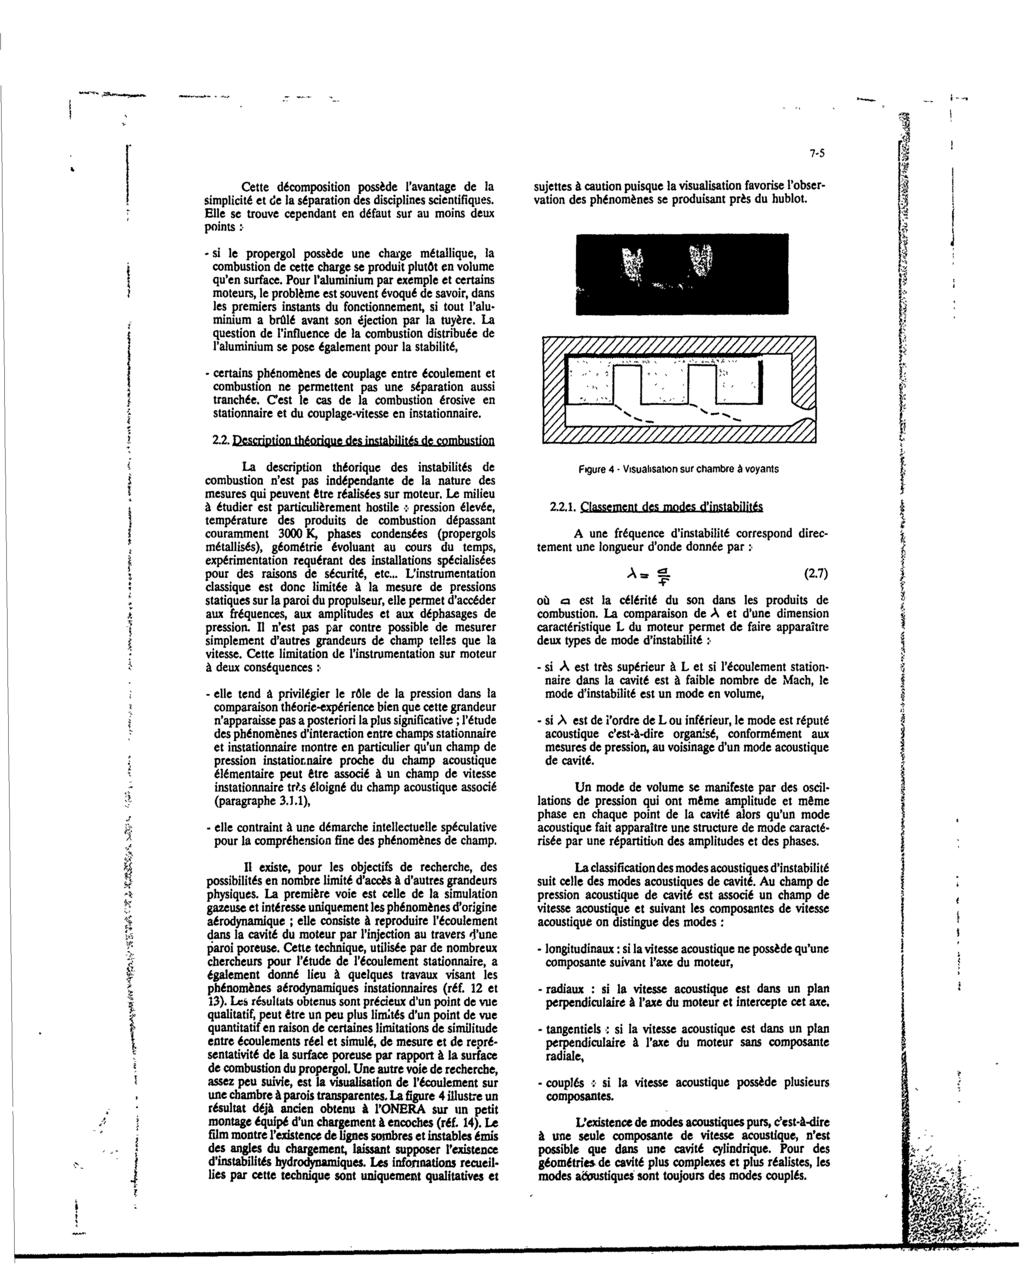 Leclerc Le Plus Proche Luxe Agard Ad A C Bustion Of solid Propellants J I Of 27 Beau Leclerc Le Plus Proche